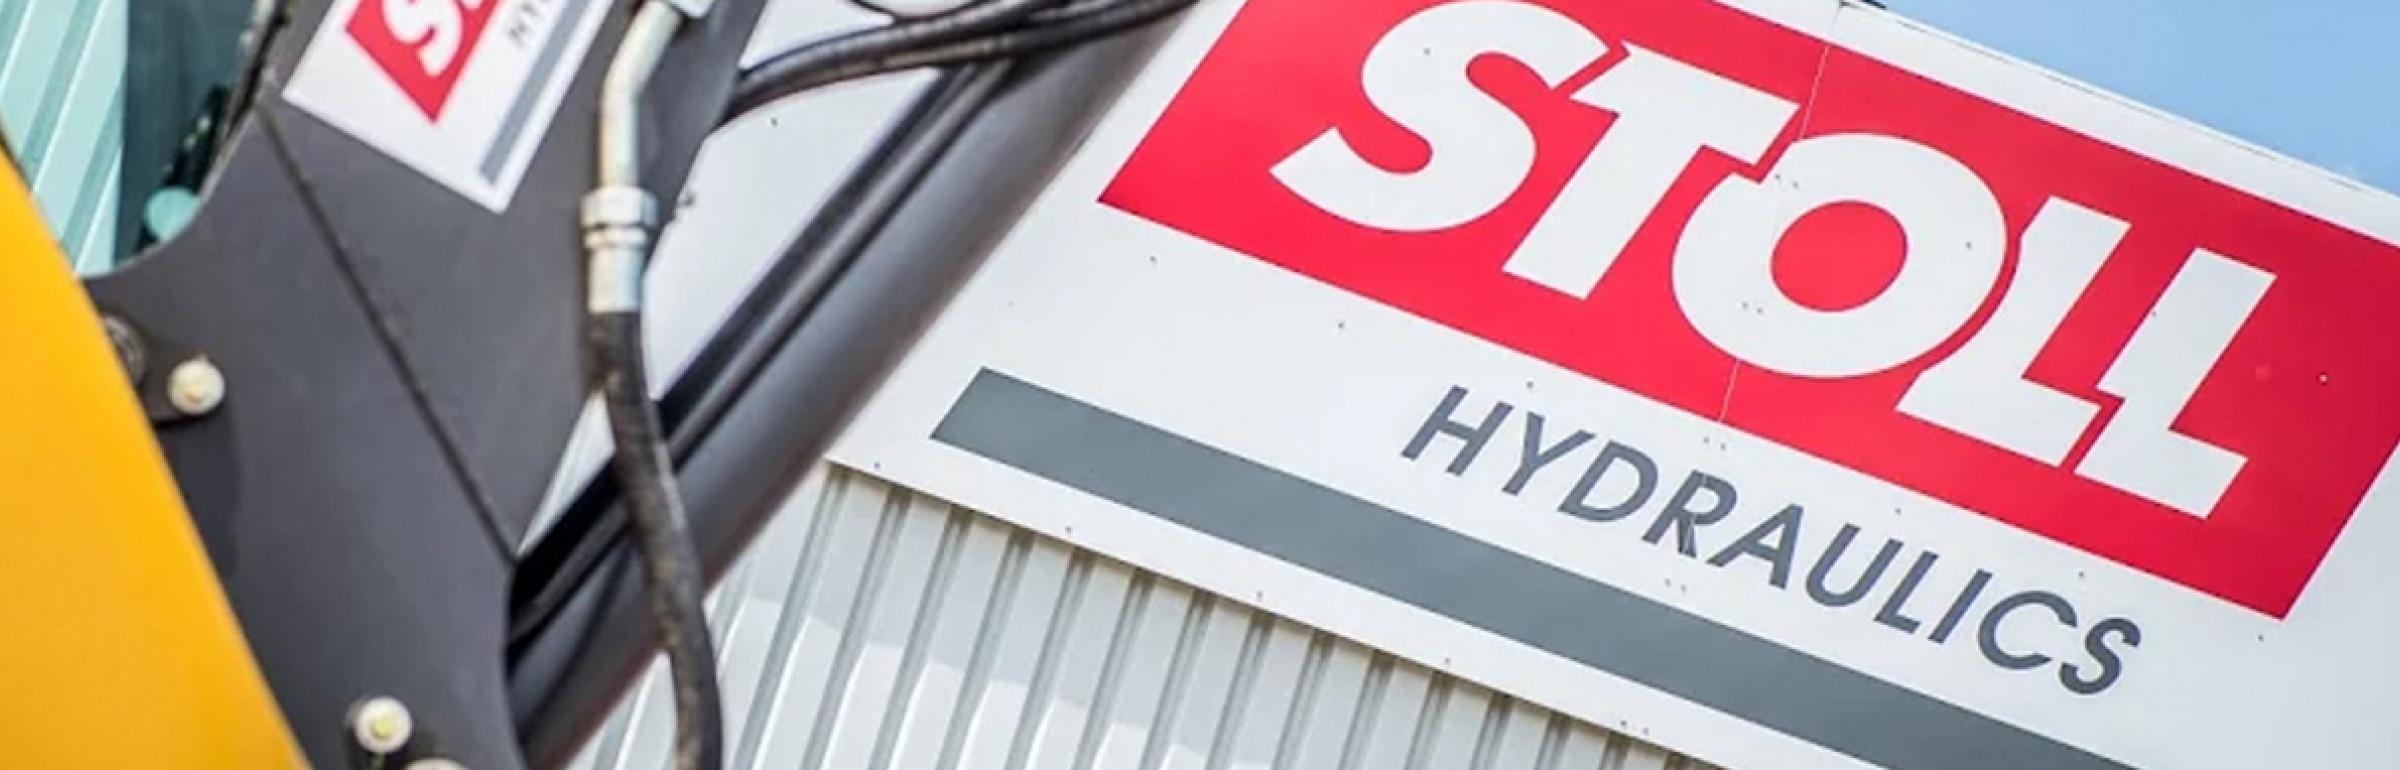 Banner Stoll Hydraulics Sàrl